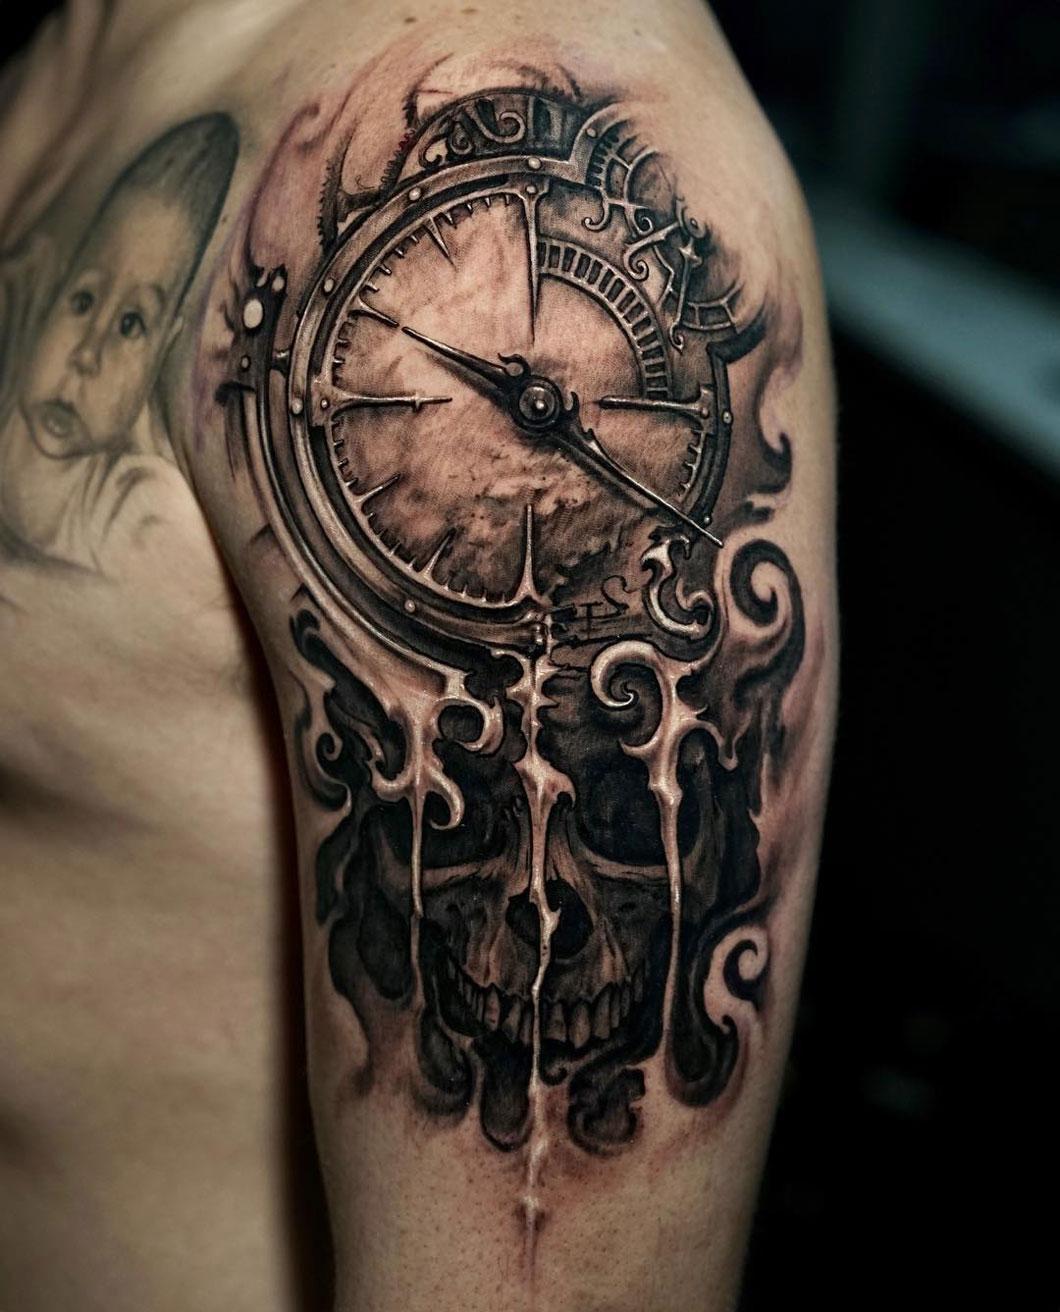 Best Tattoo Artist Las Vegas